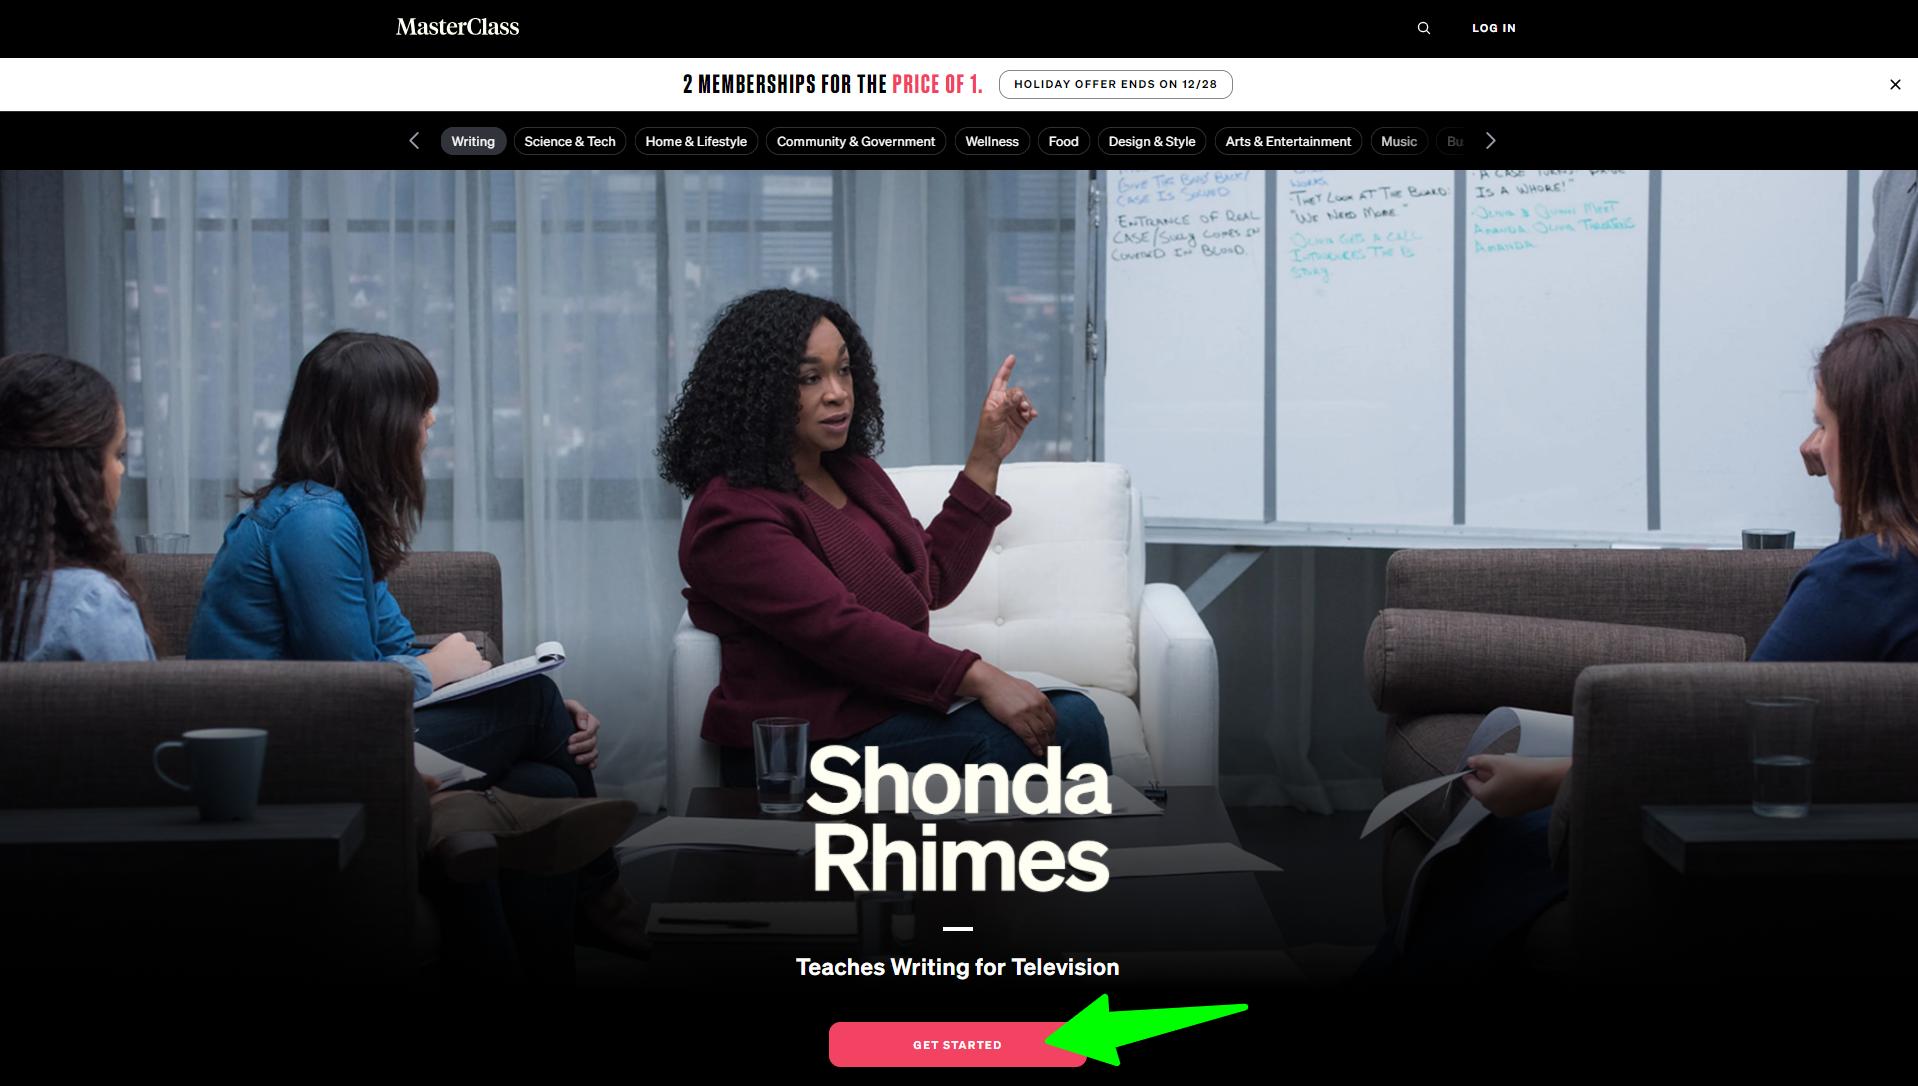 Shonda-Rhimes-Teaches-Writing-for-Television-MasterClass